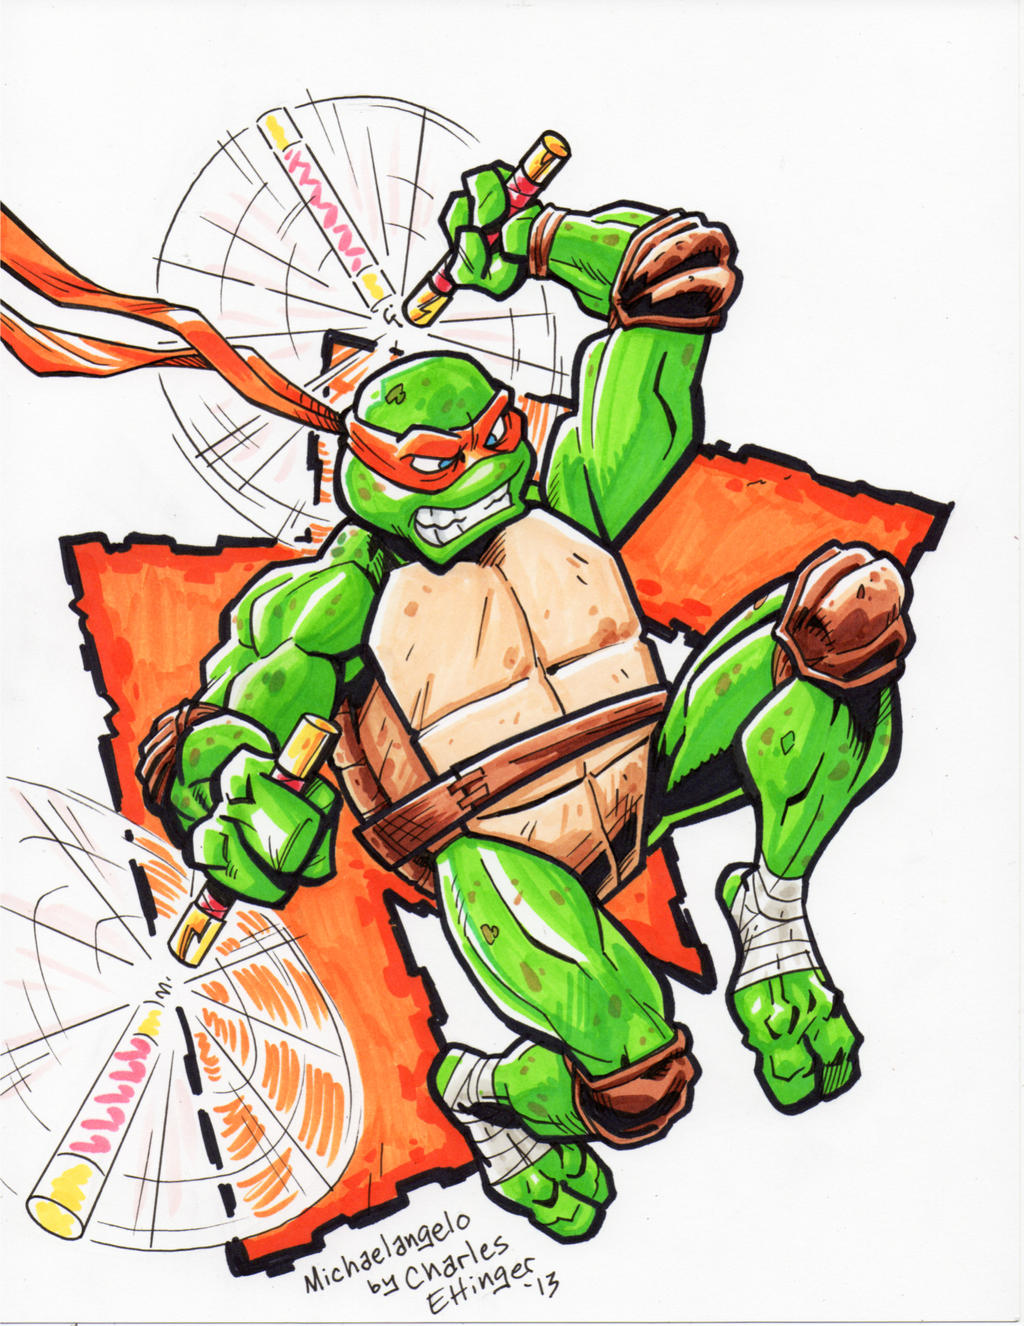 Michelangelo Teenage Mutant Ninja Turtles  Wikipedia